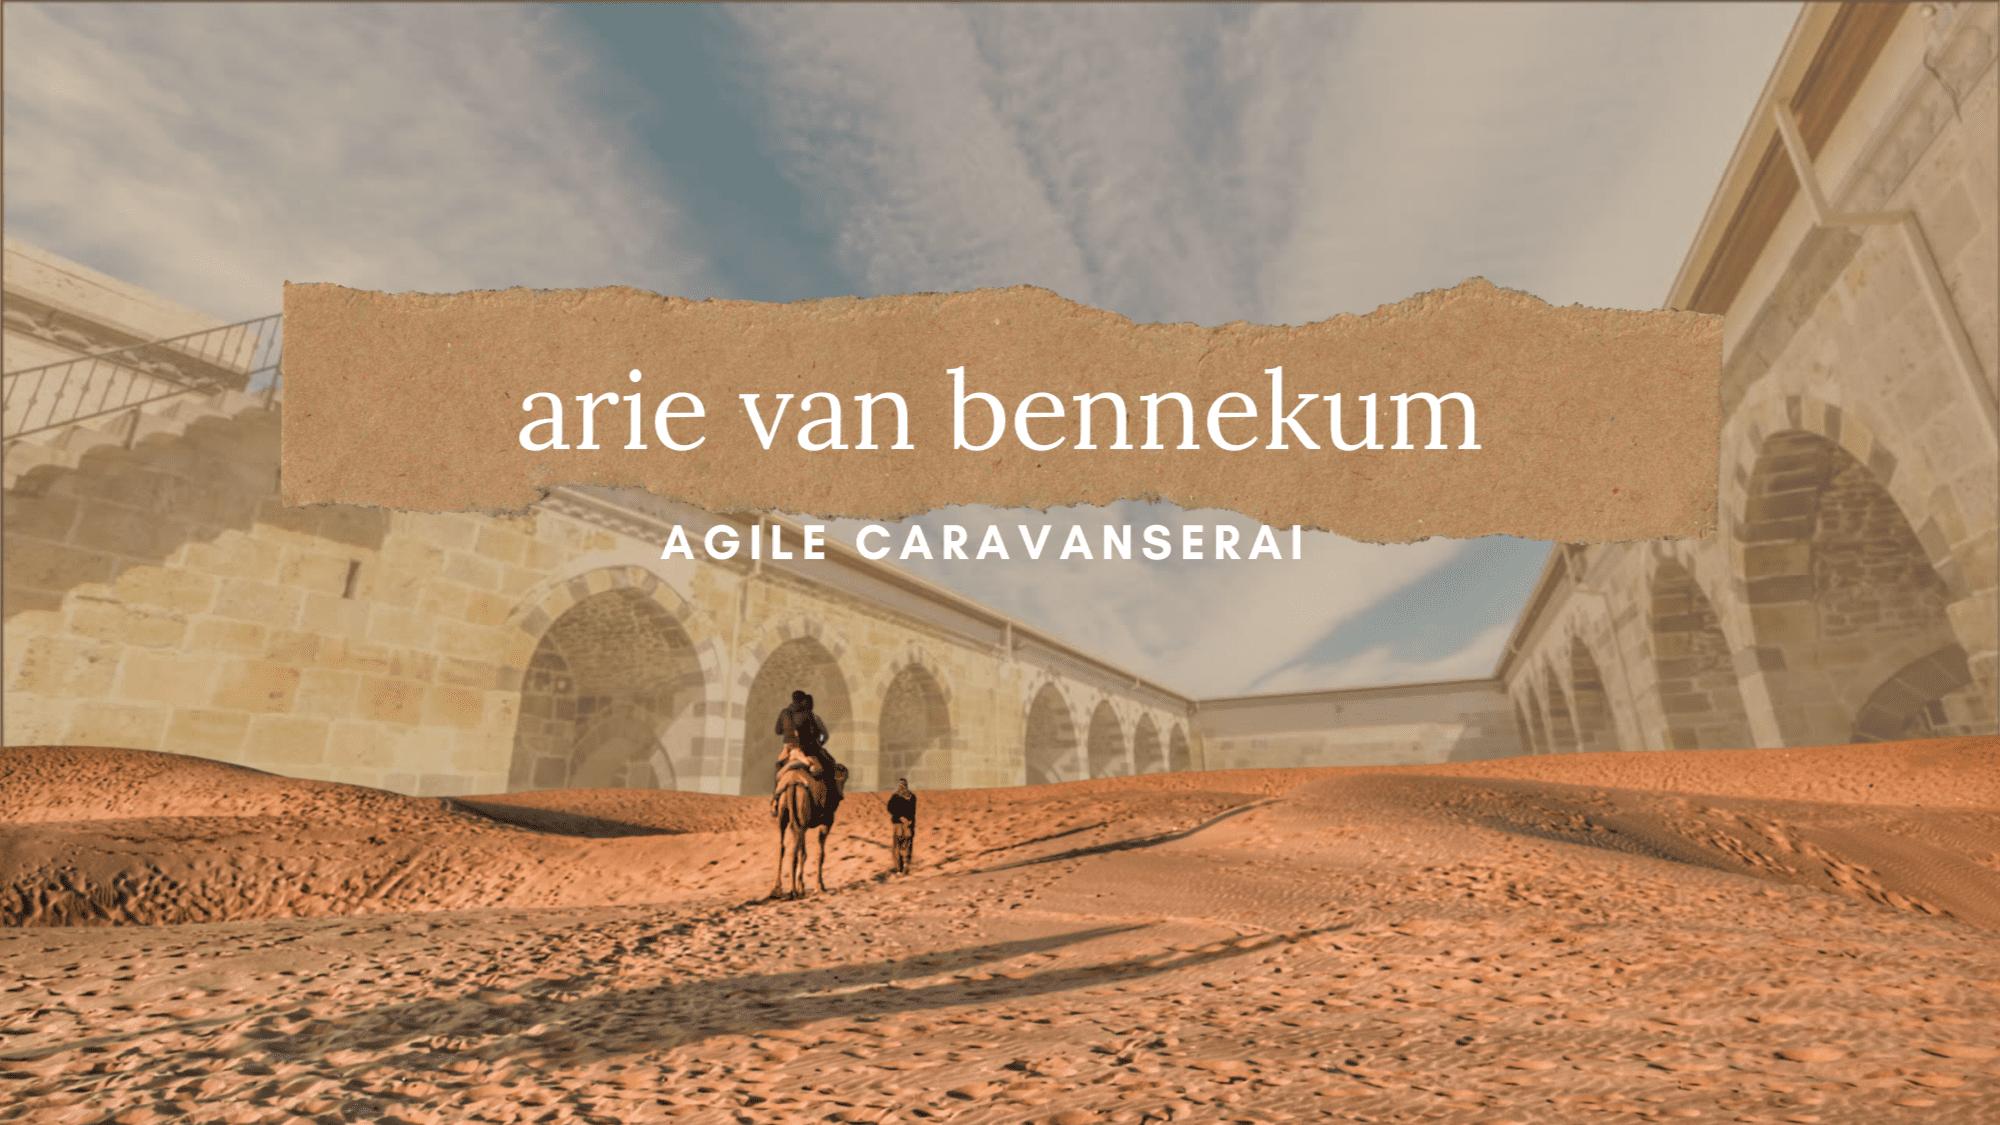 Agile Caravanserai Arie van Bennekum